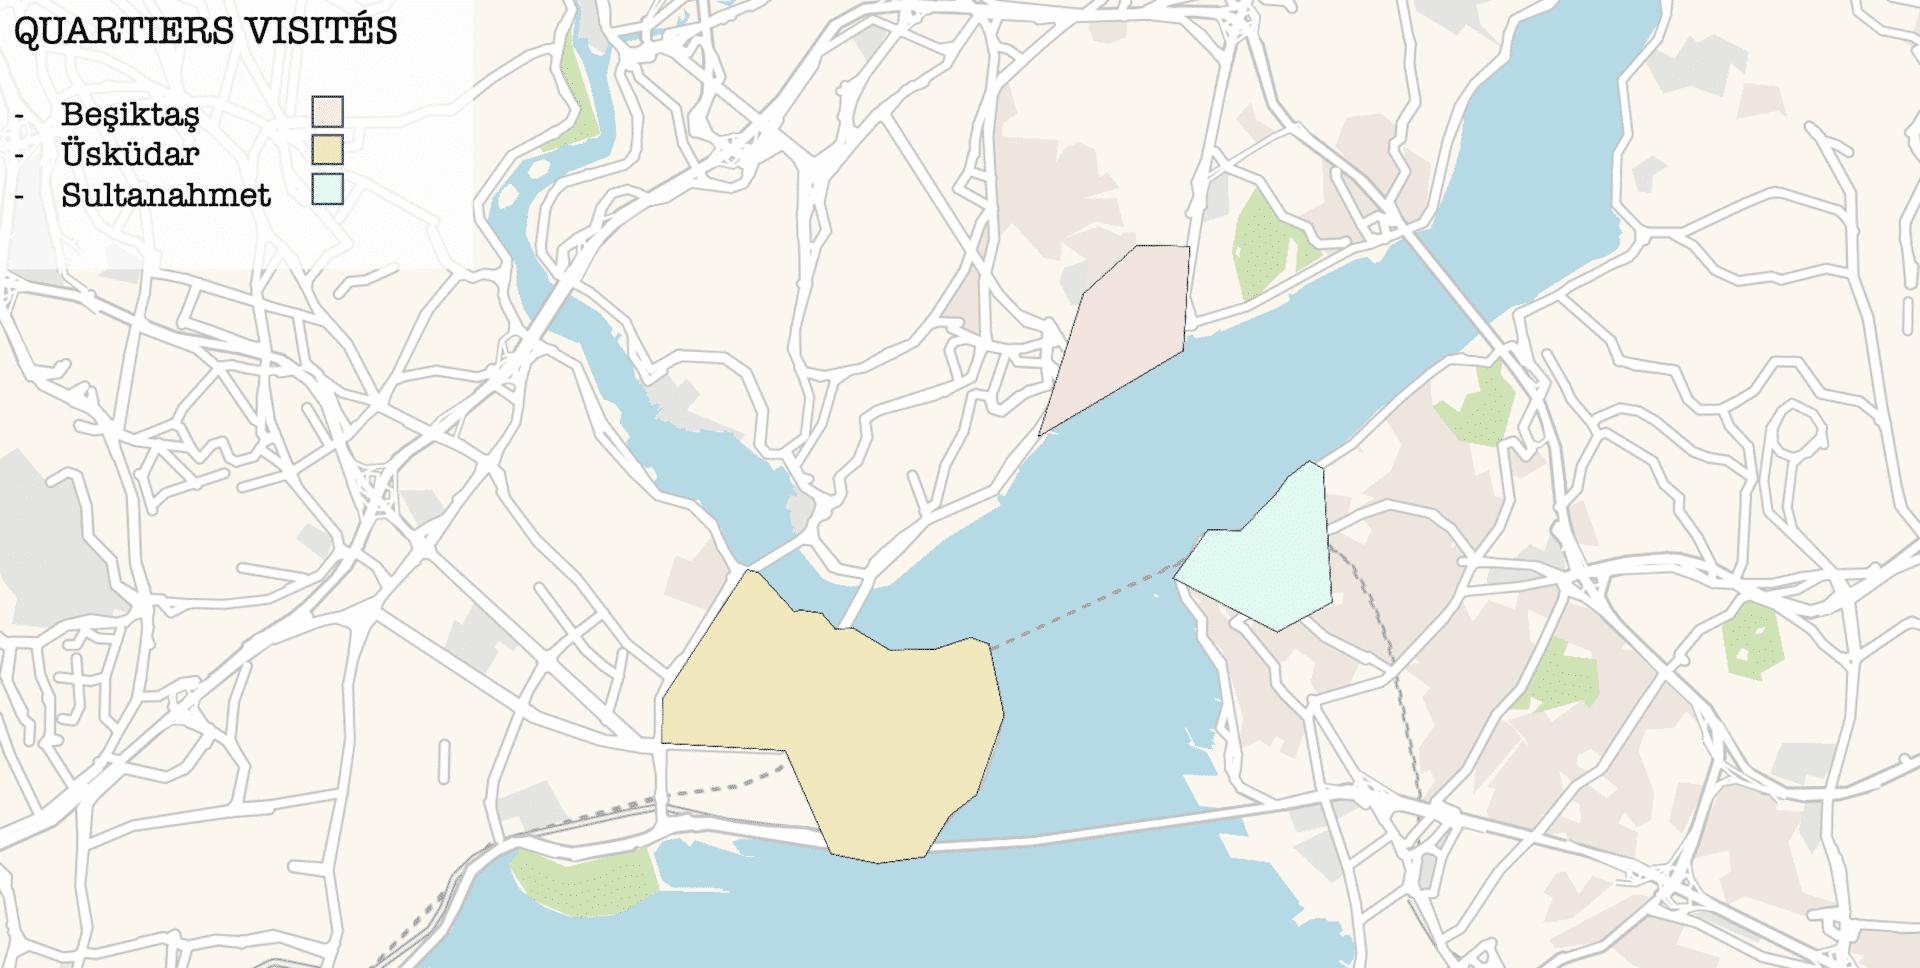 quartiers-visites- besiktas-uskudar-sultanahmet-tooistanbul